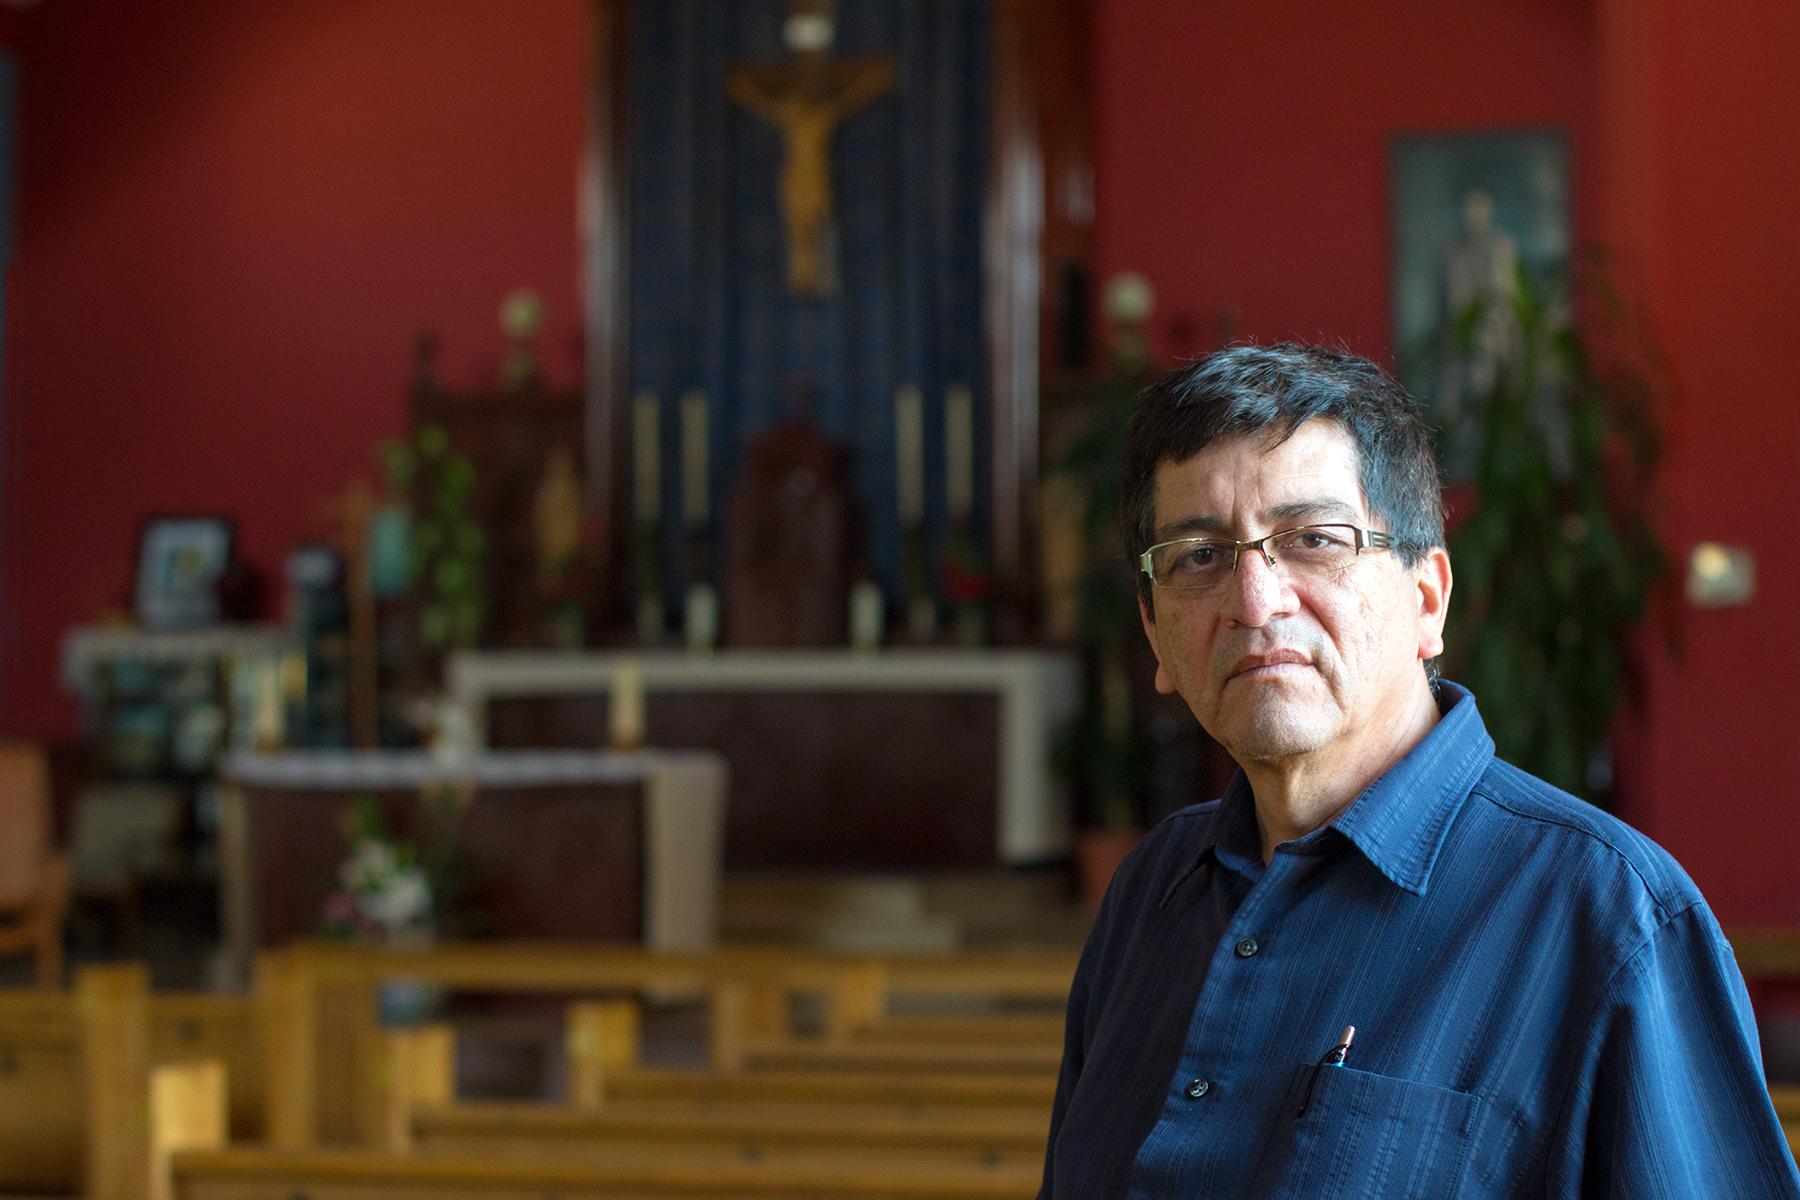 Miguel in the St-Rita Scalabrini church, 655 Sauriol Street East